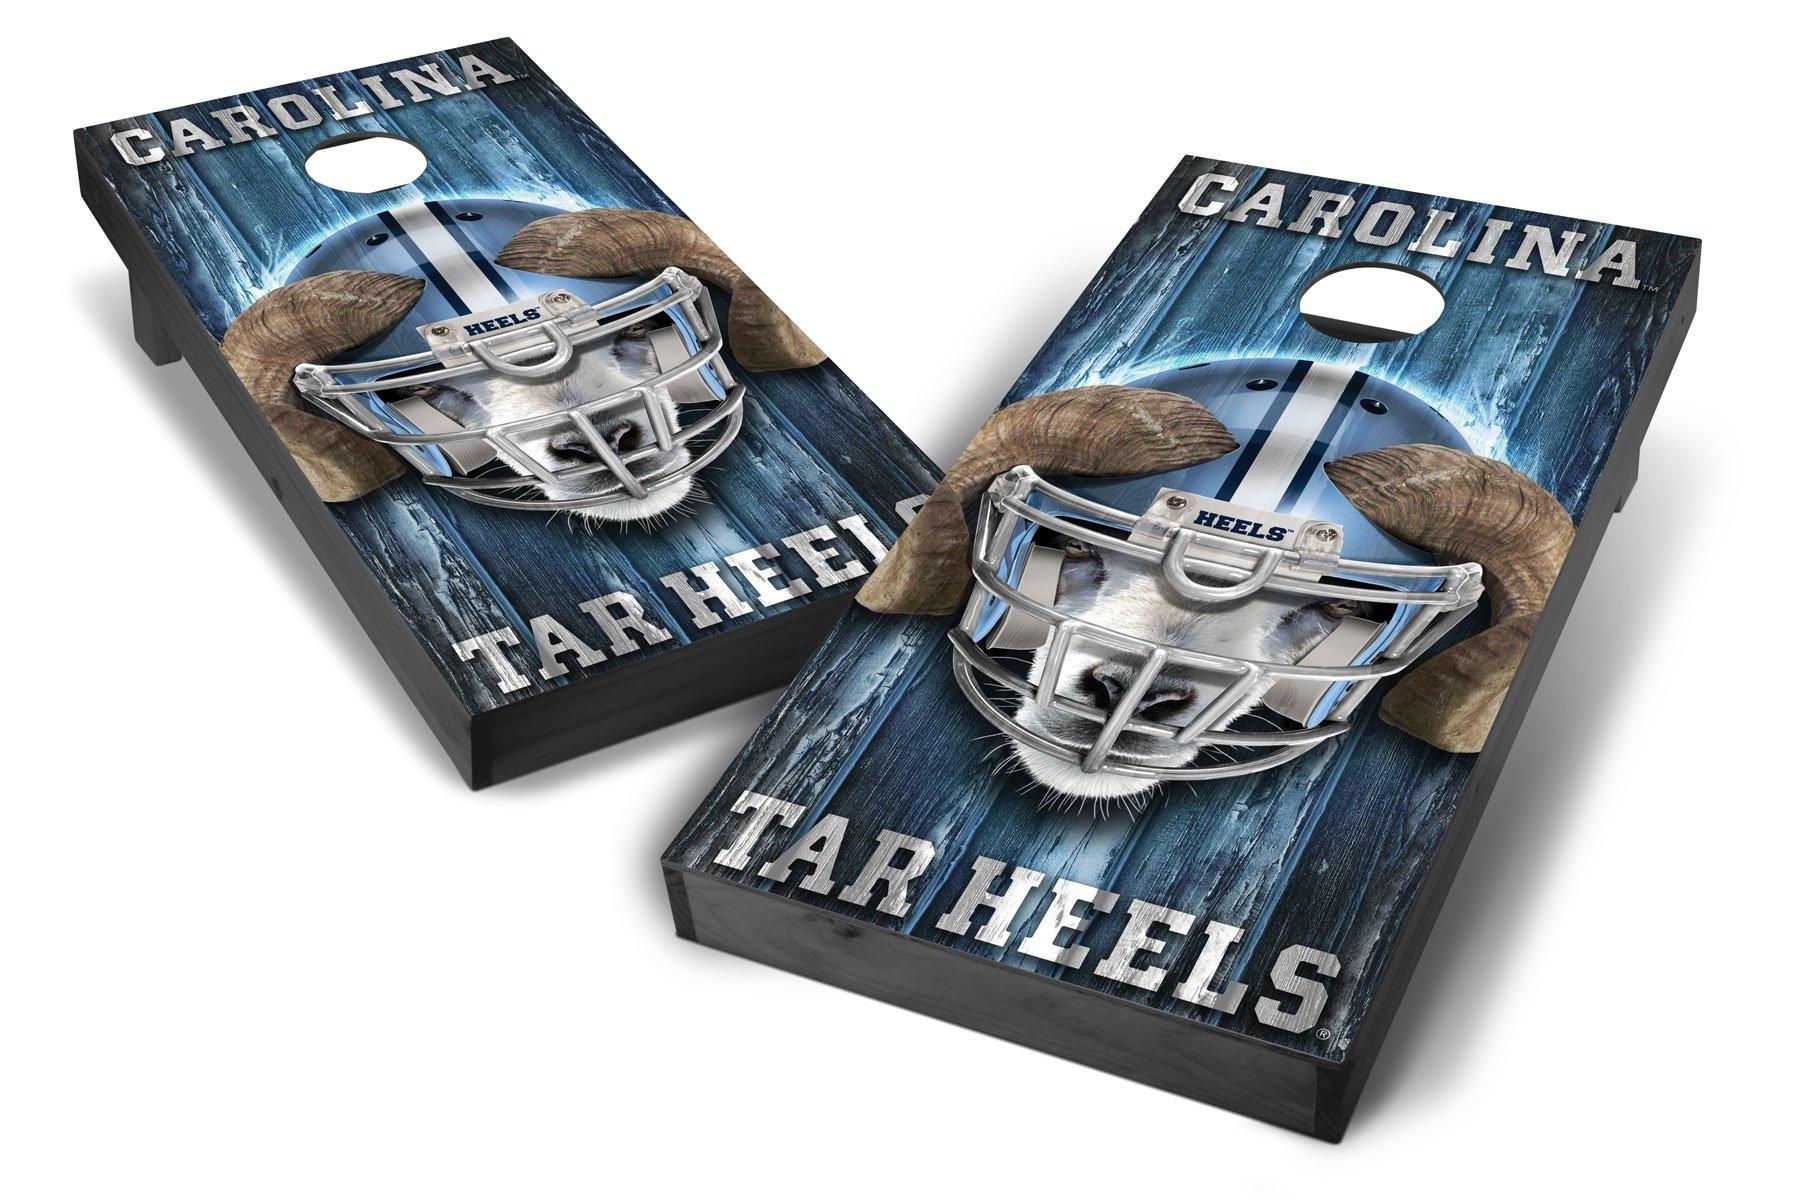 PROLINE NCAA College North Carolina Tar Heels 2'x4' Cornhole Board Set - Mascot Design, Grey